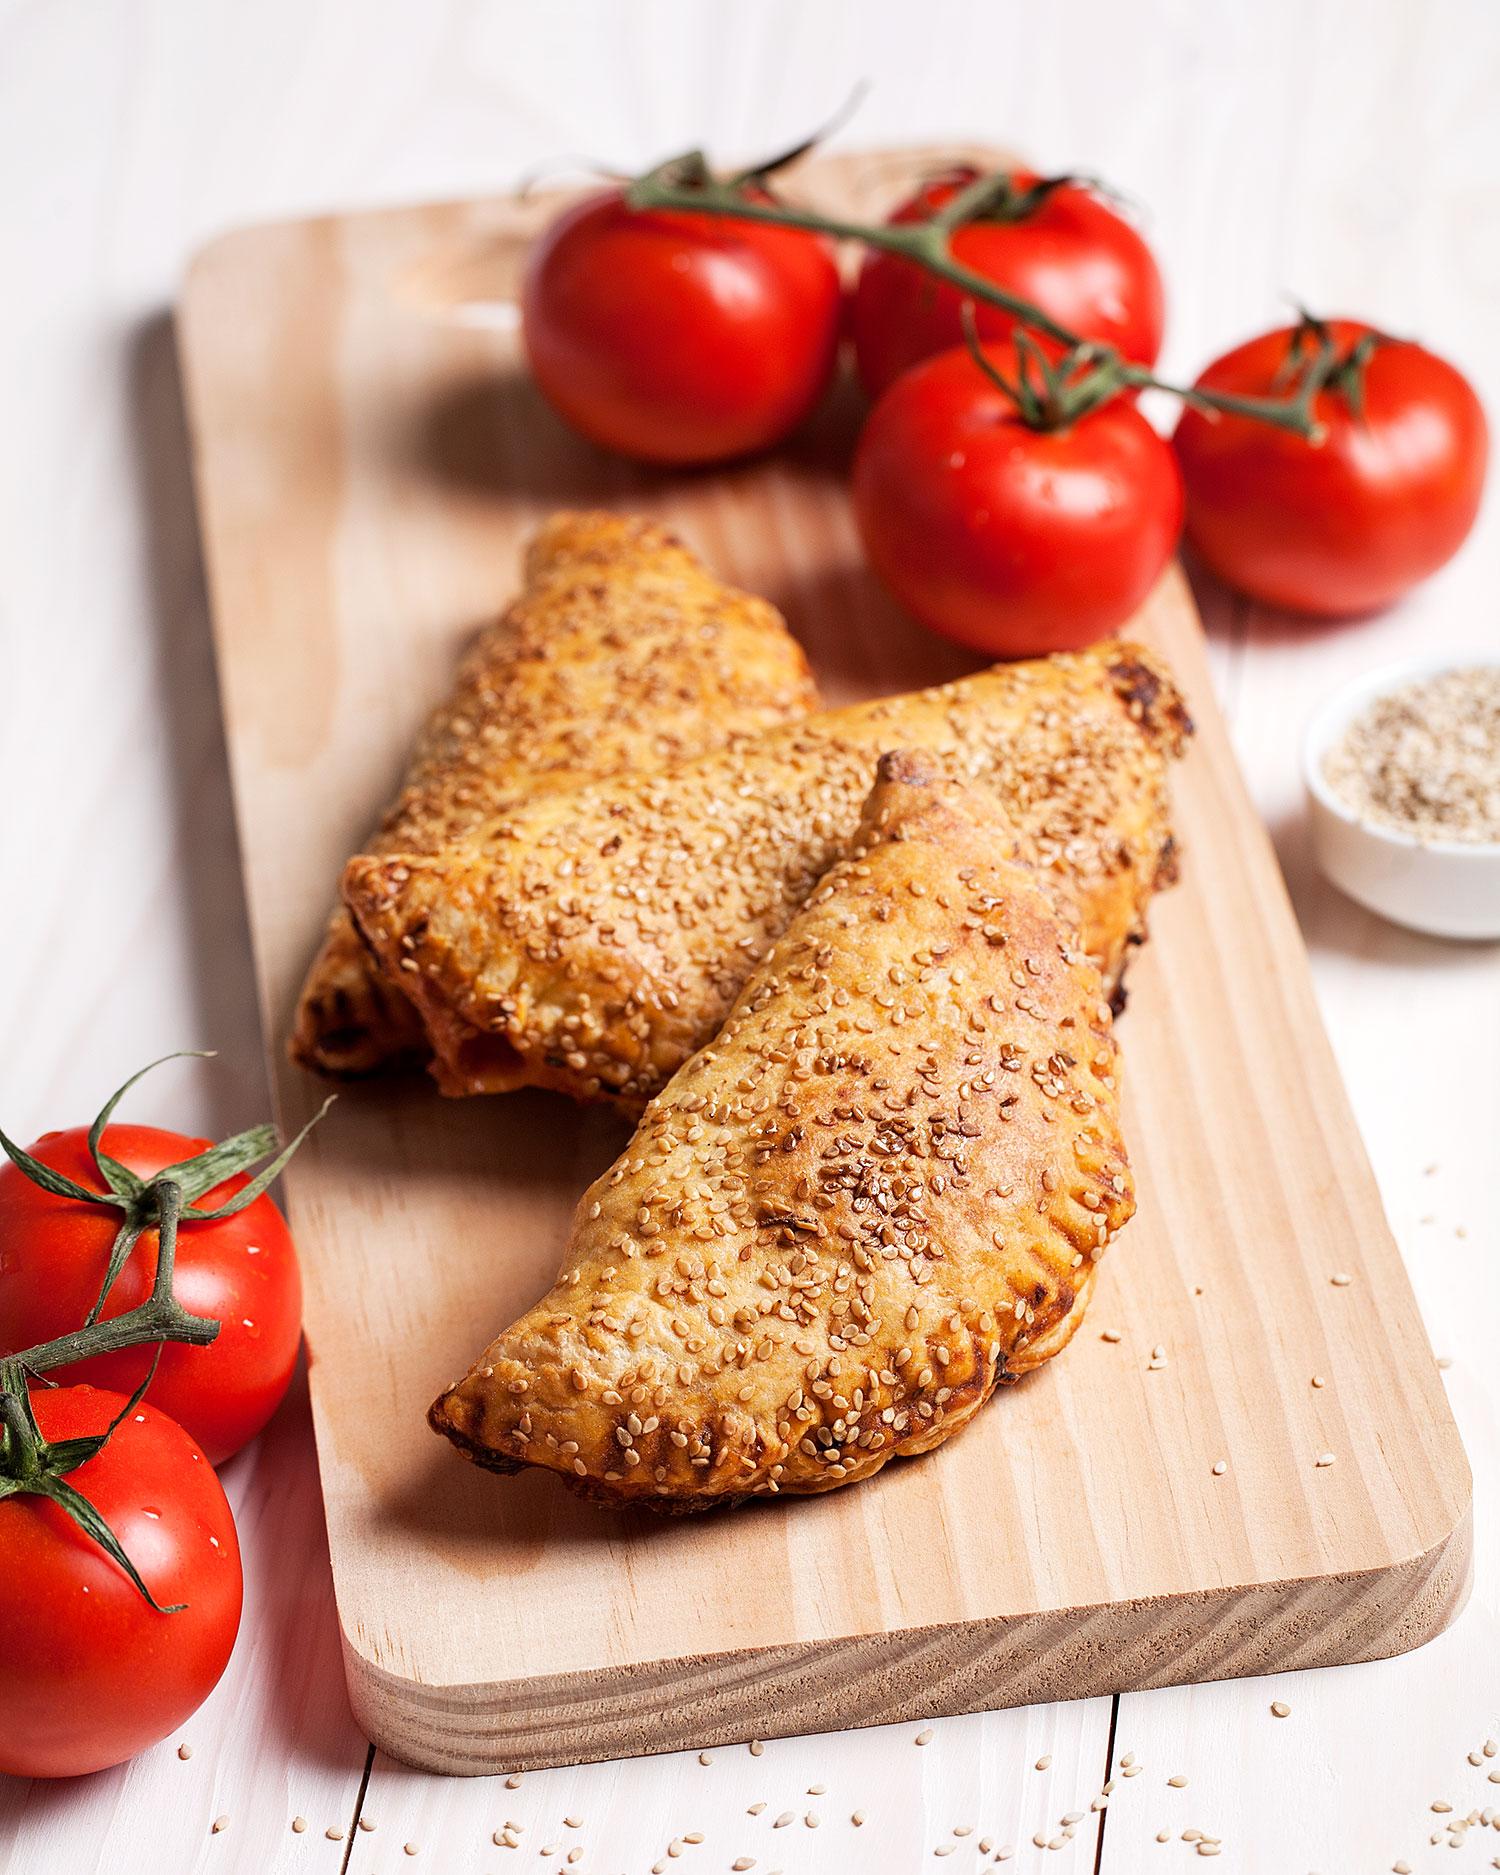 corina-landa-food-photography-fotografia-gastronomica-25.jpg